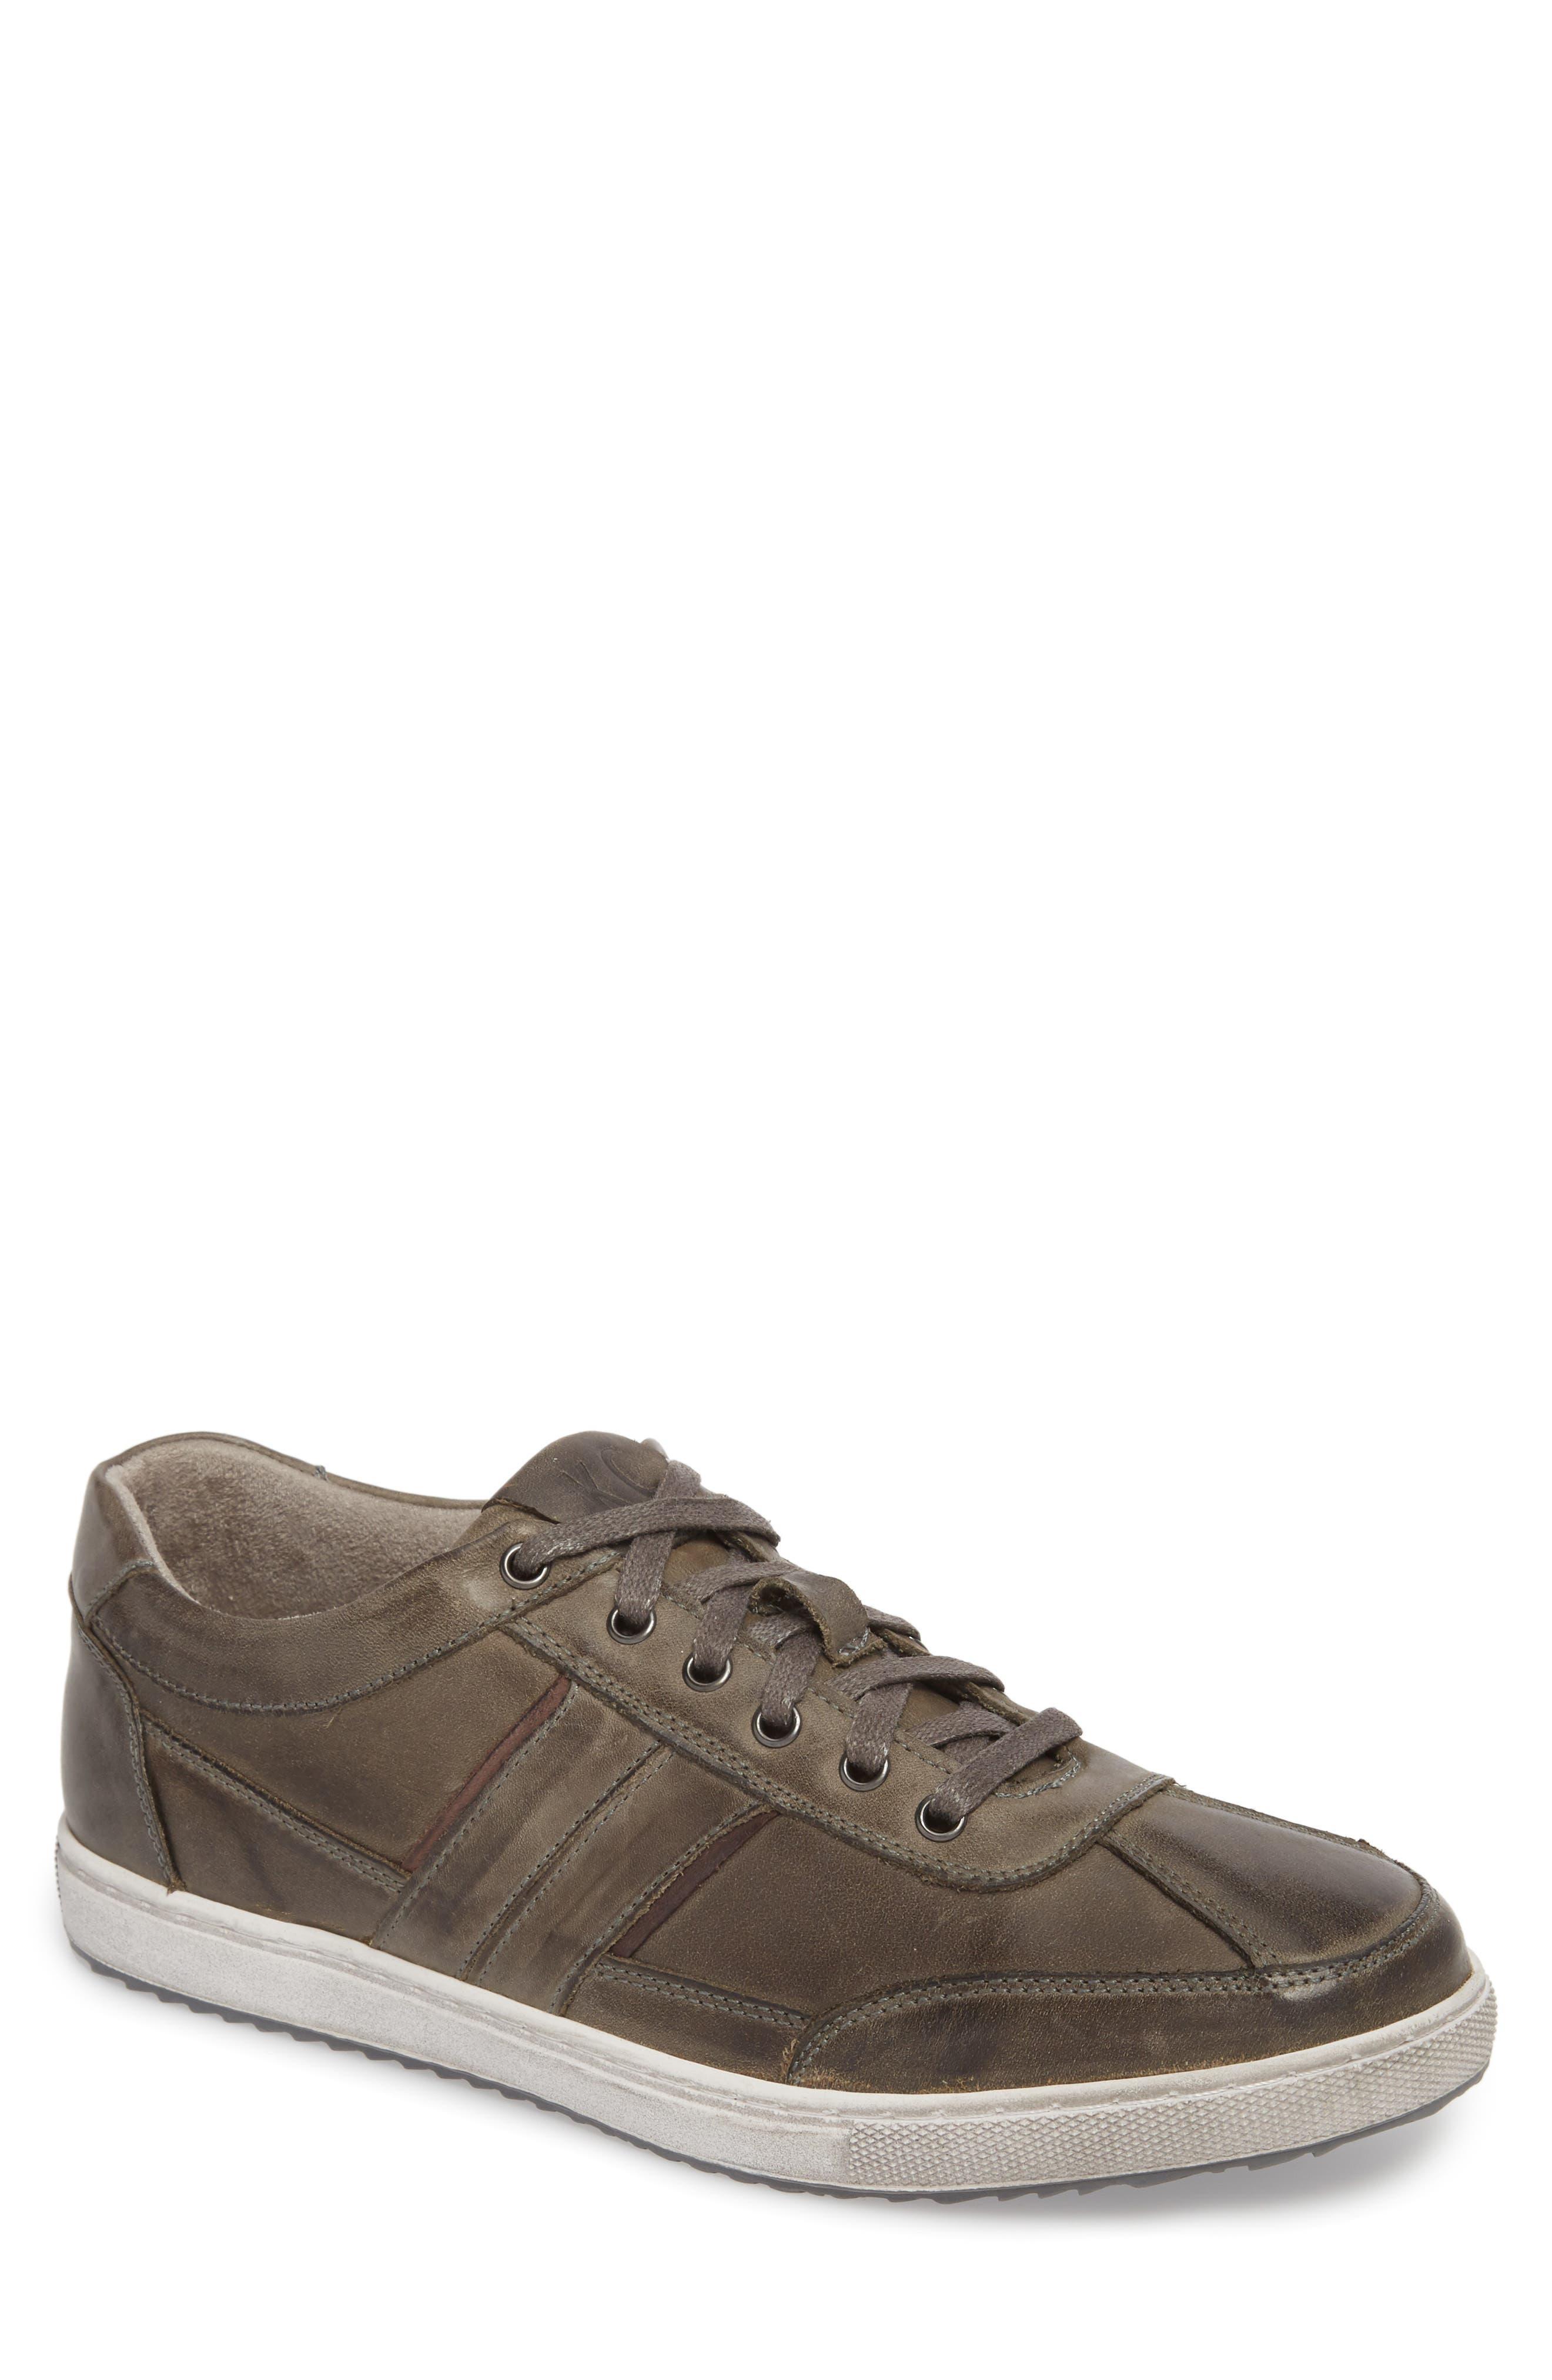 Sprinter Low Top Sneaker,                             Main thumbnail 1, color,                             Grey